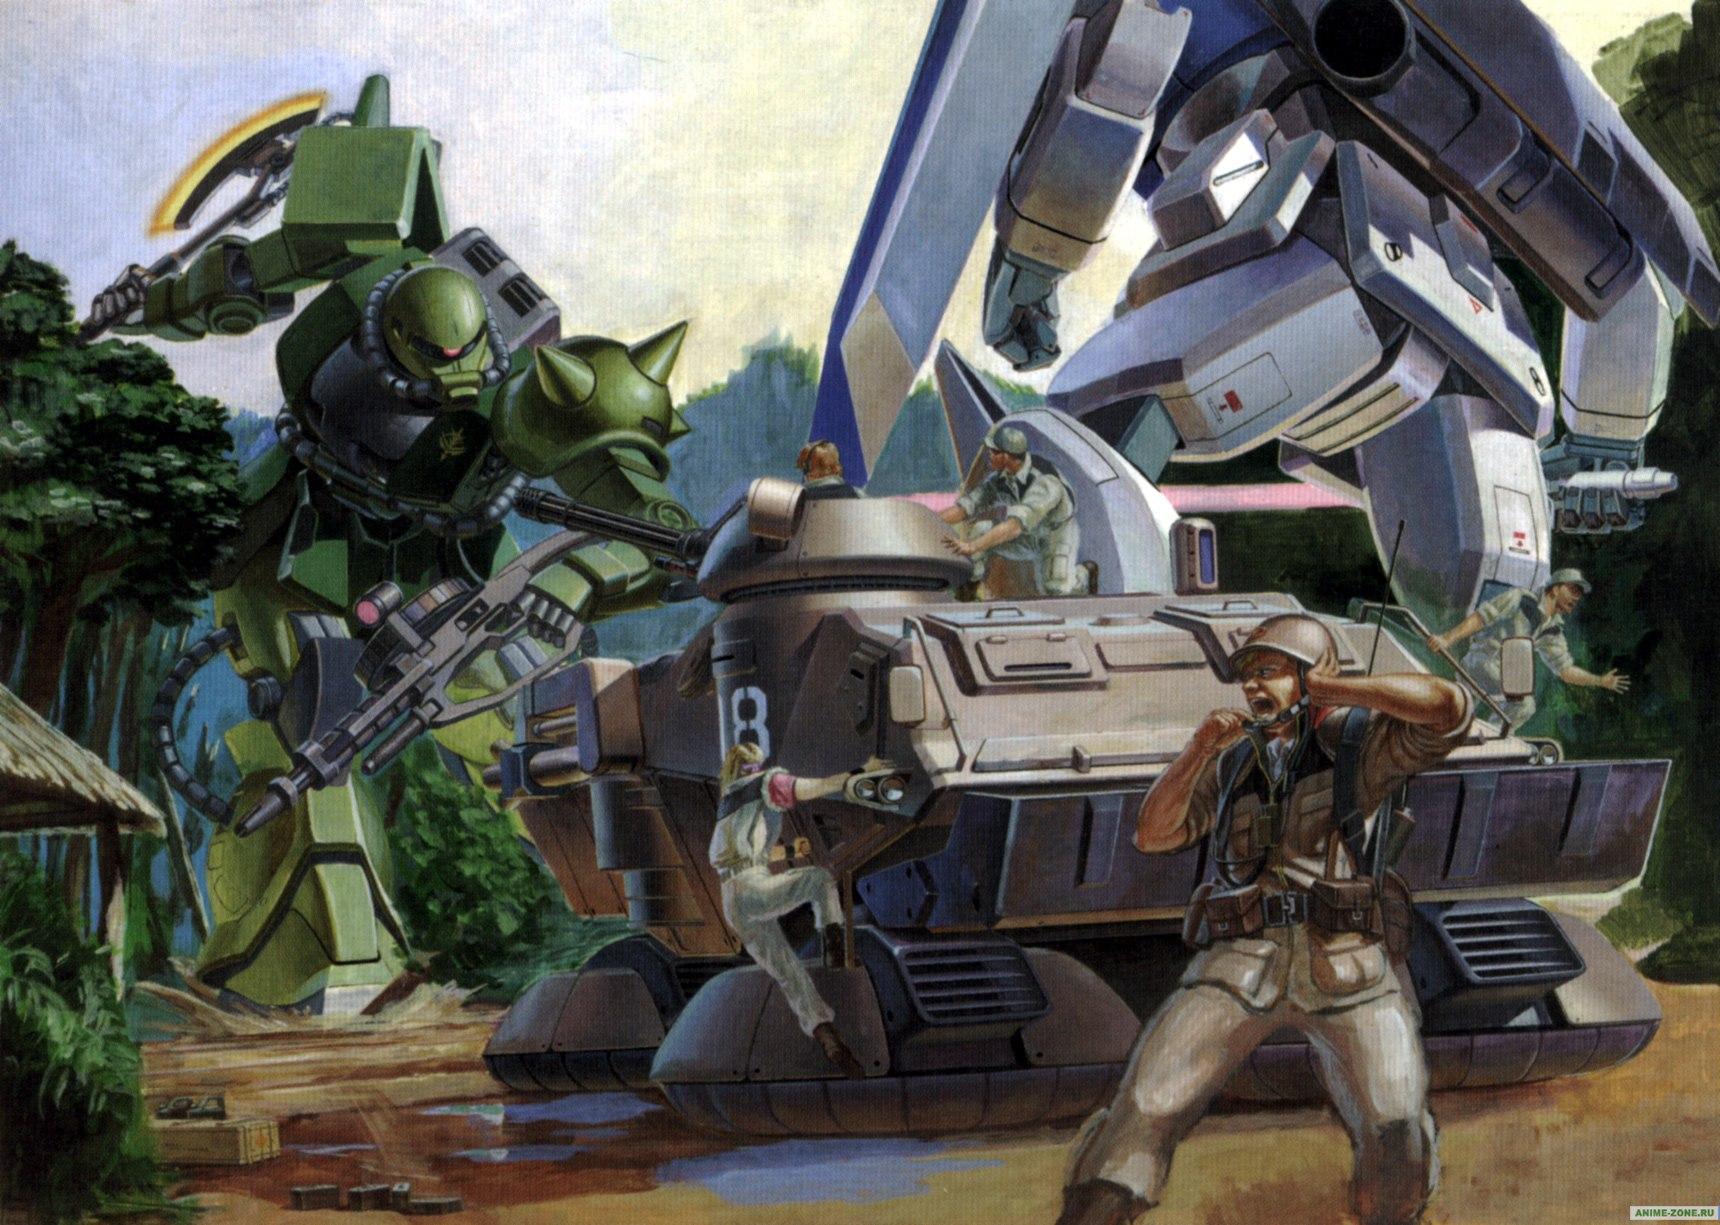 ... -Zone. Аниме обои к Mobile Suit Gundam: The 08th MS Team